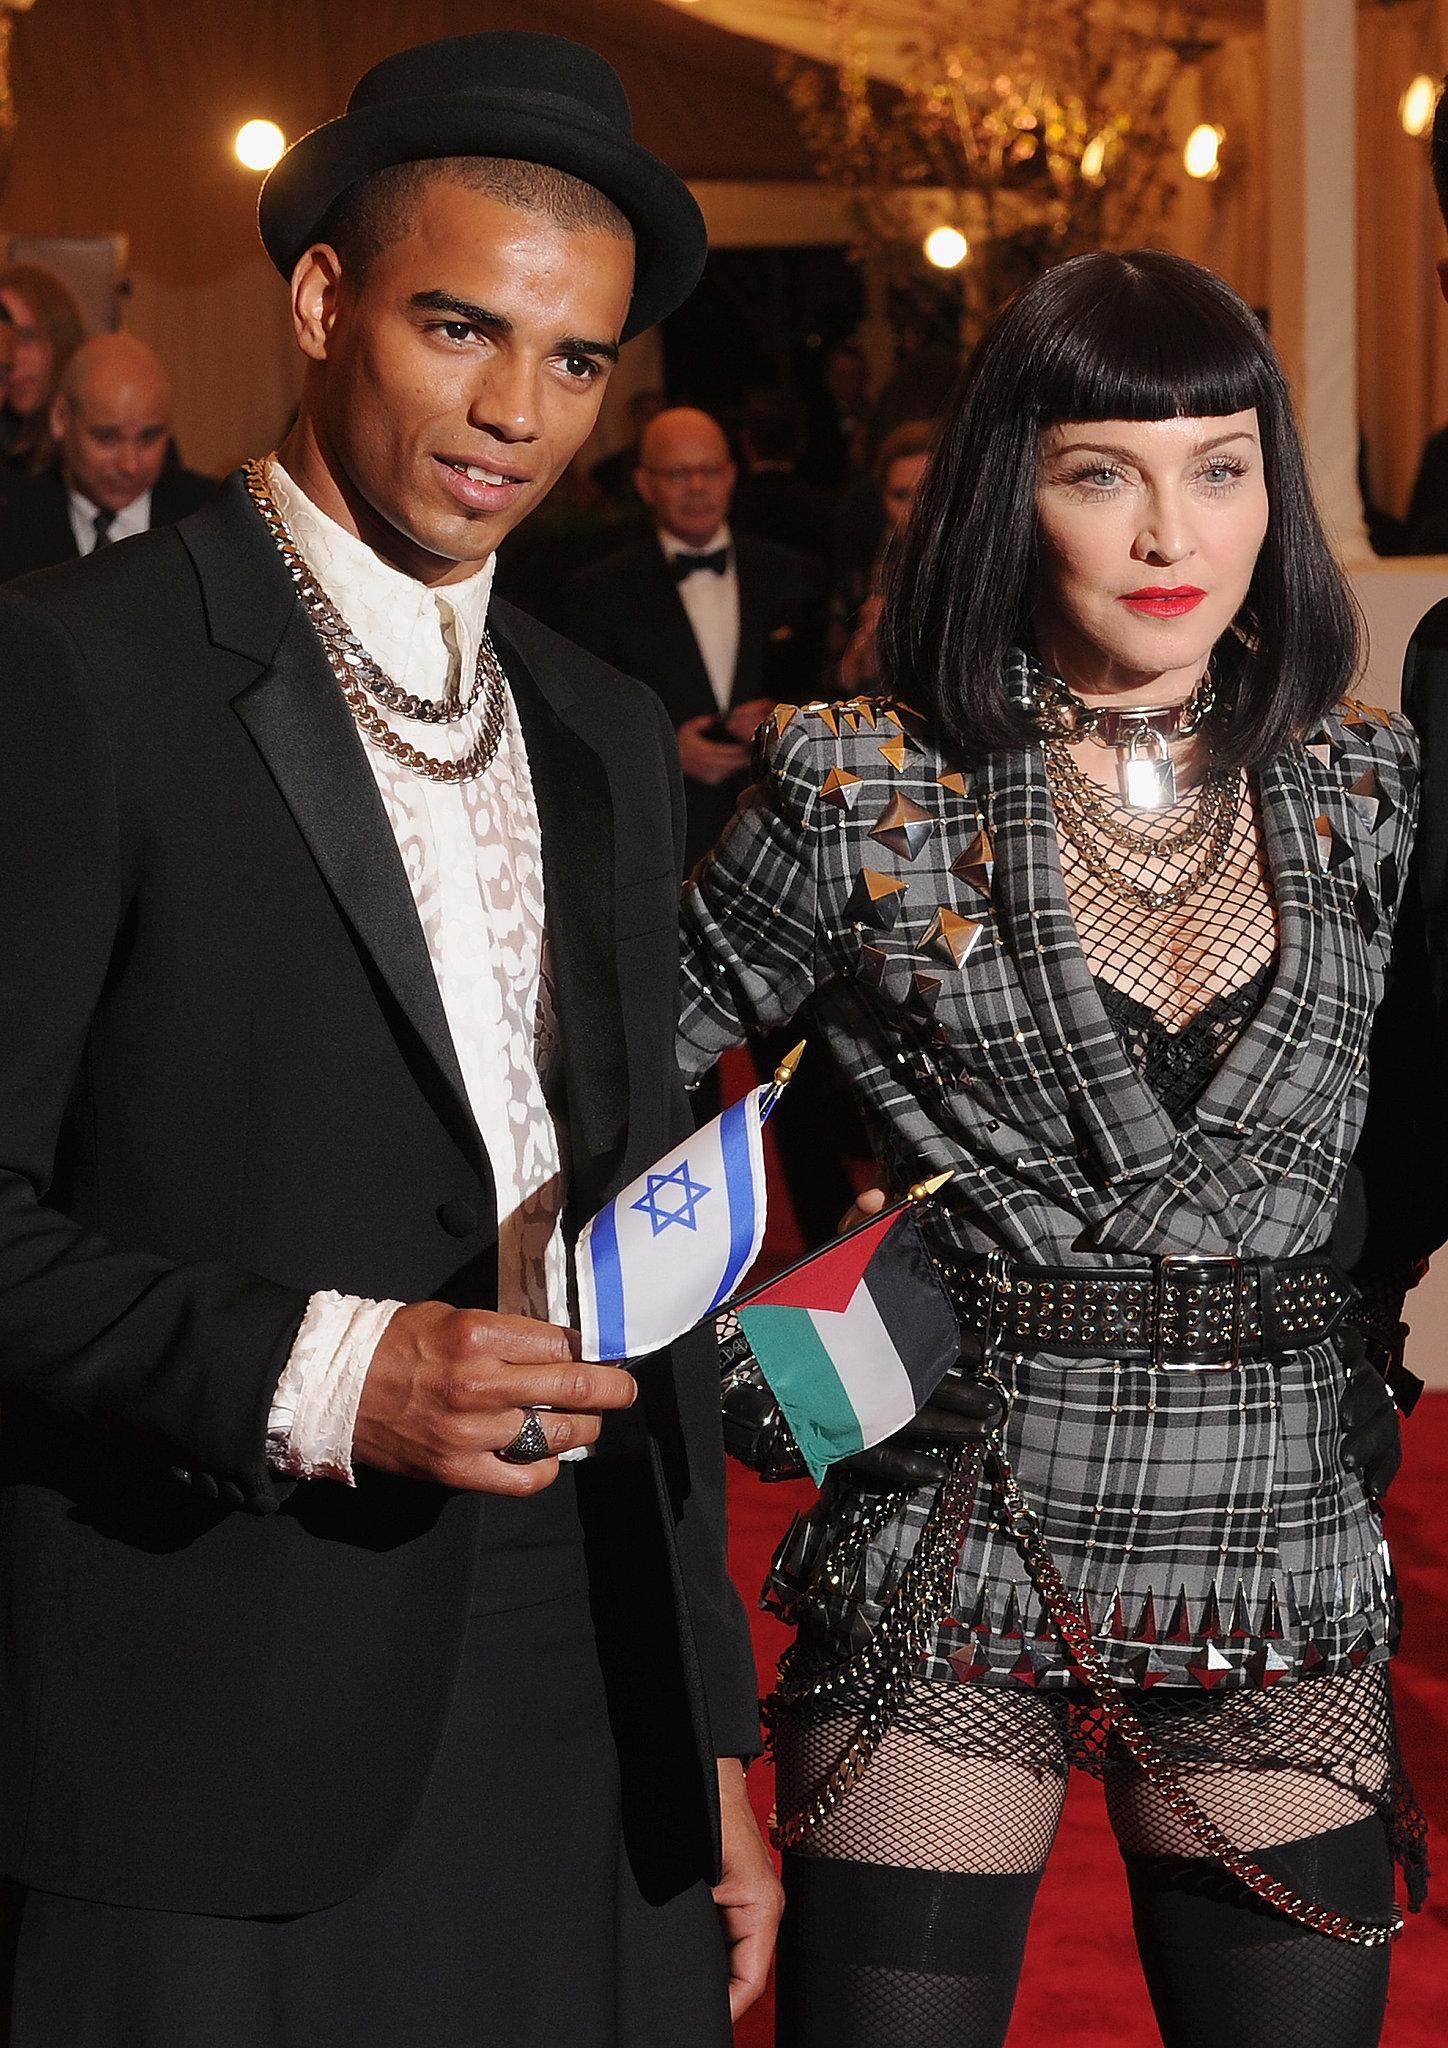 Madonna and Brahim Zaibat